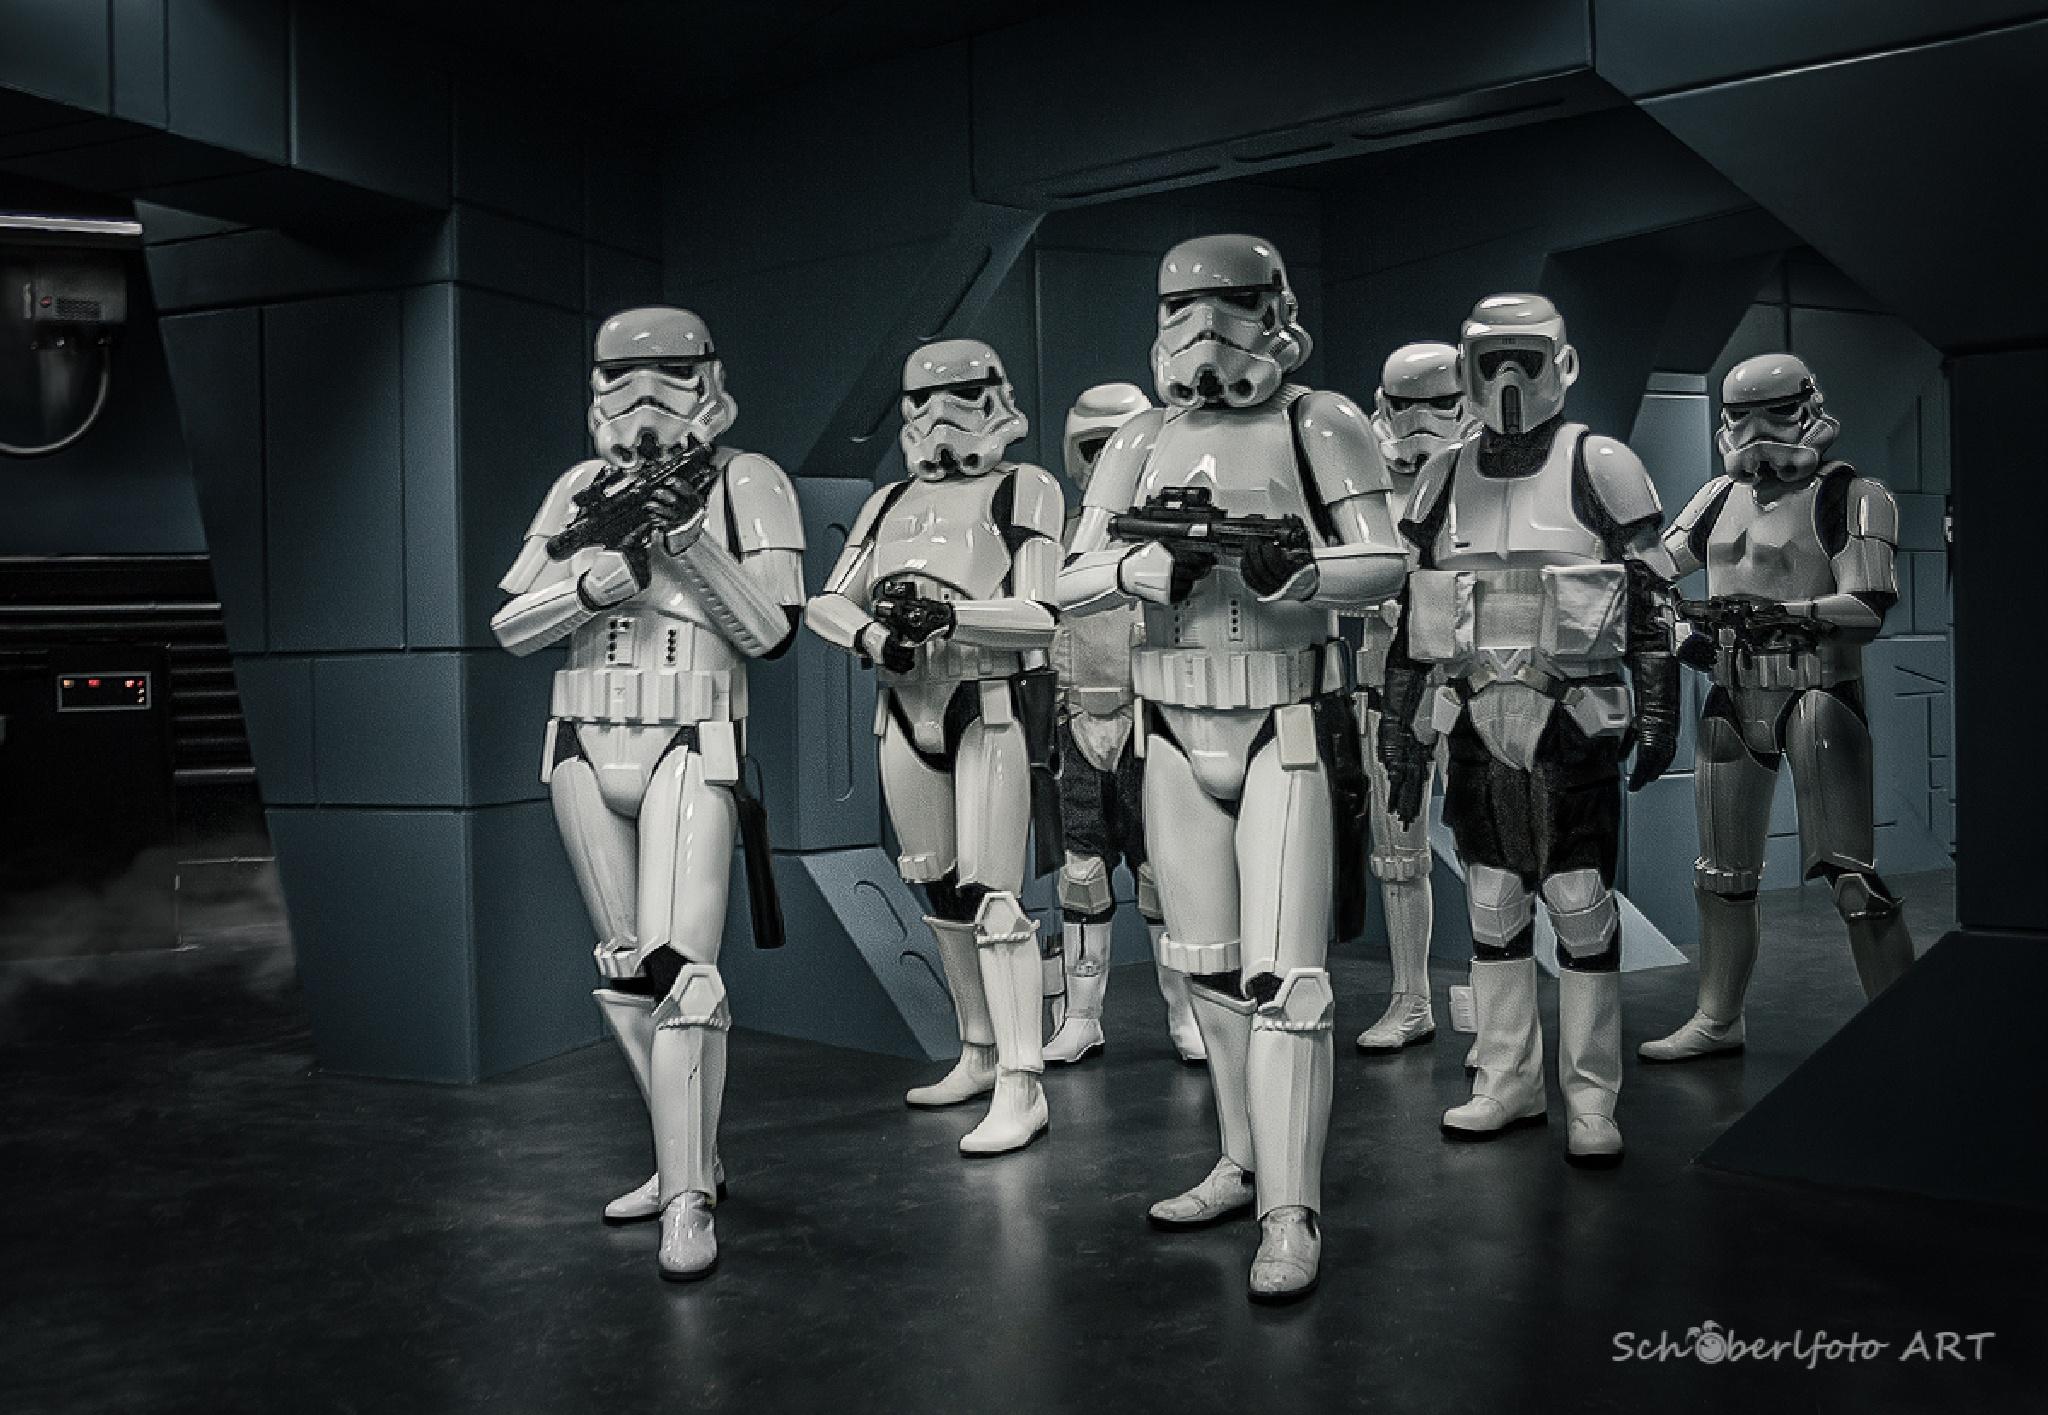 Stormtroopers by Schöberlfoto-ART